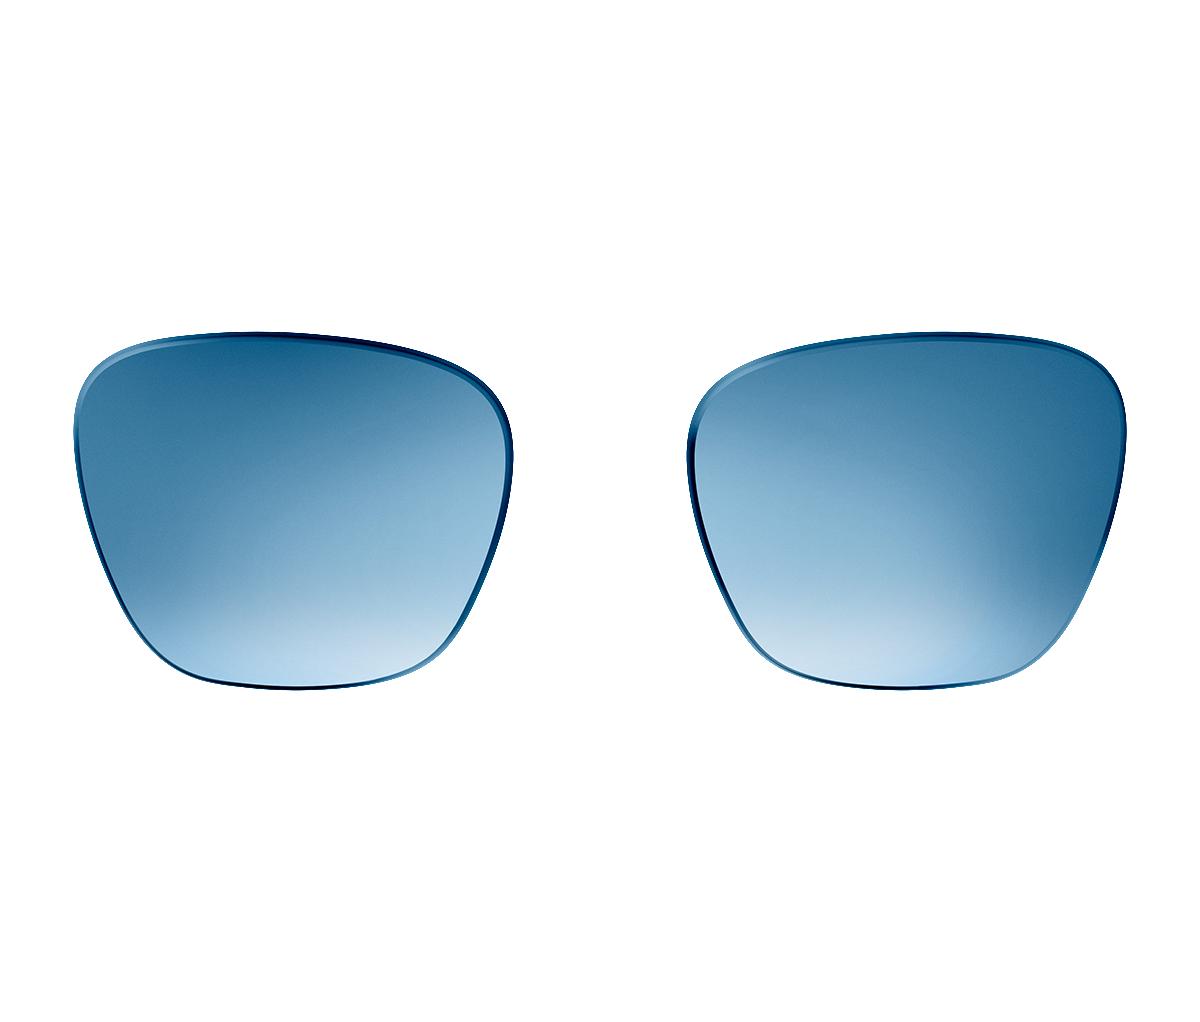 Bose_Lenses_Alto_style